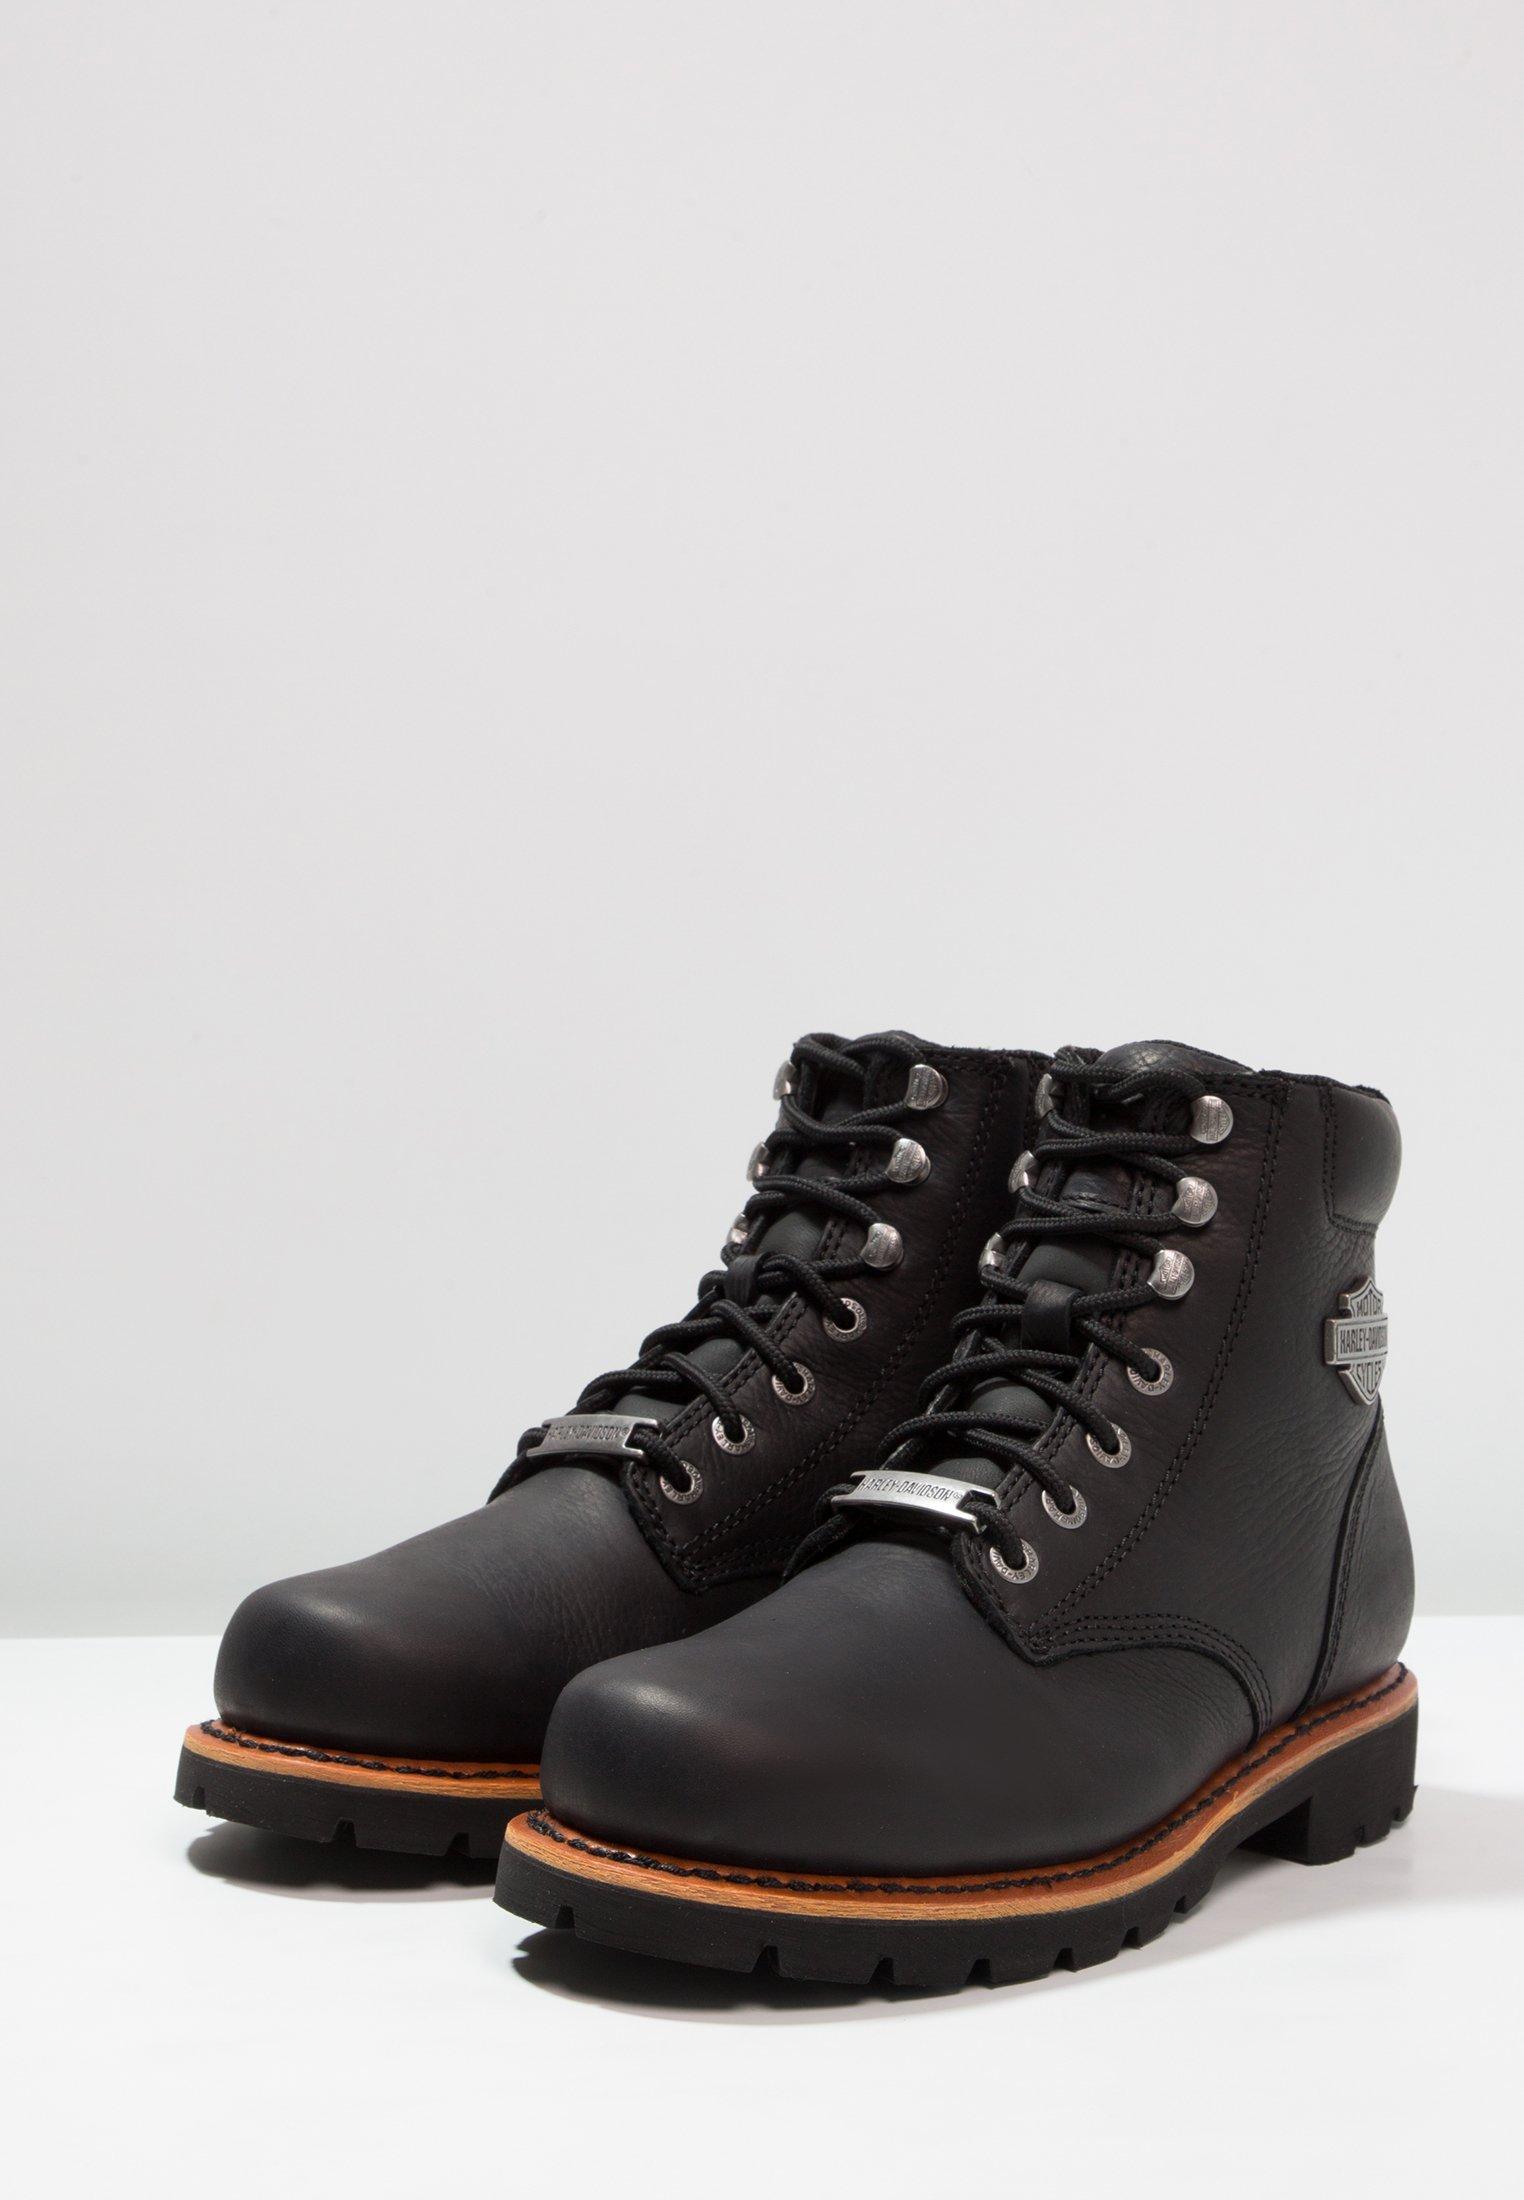 Harley Davidson VISTA RIDGE - Botines con cordones - black